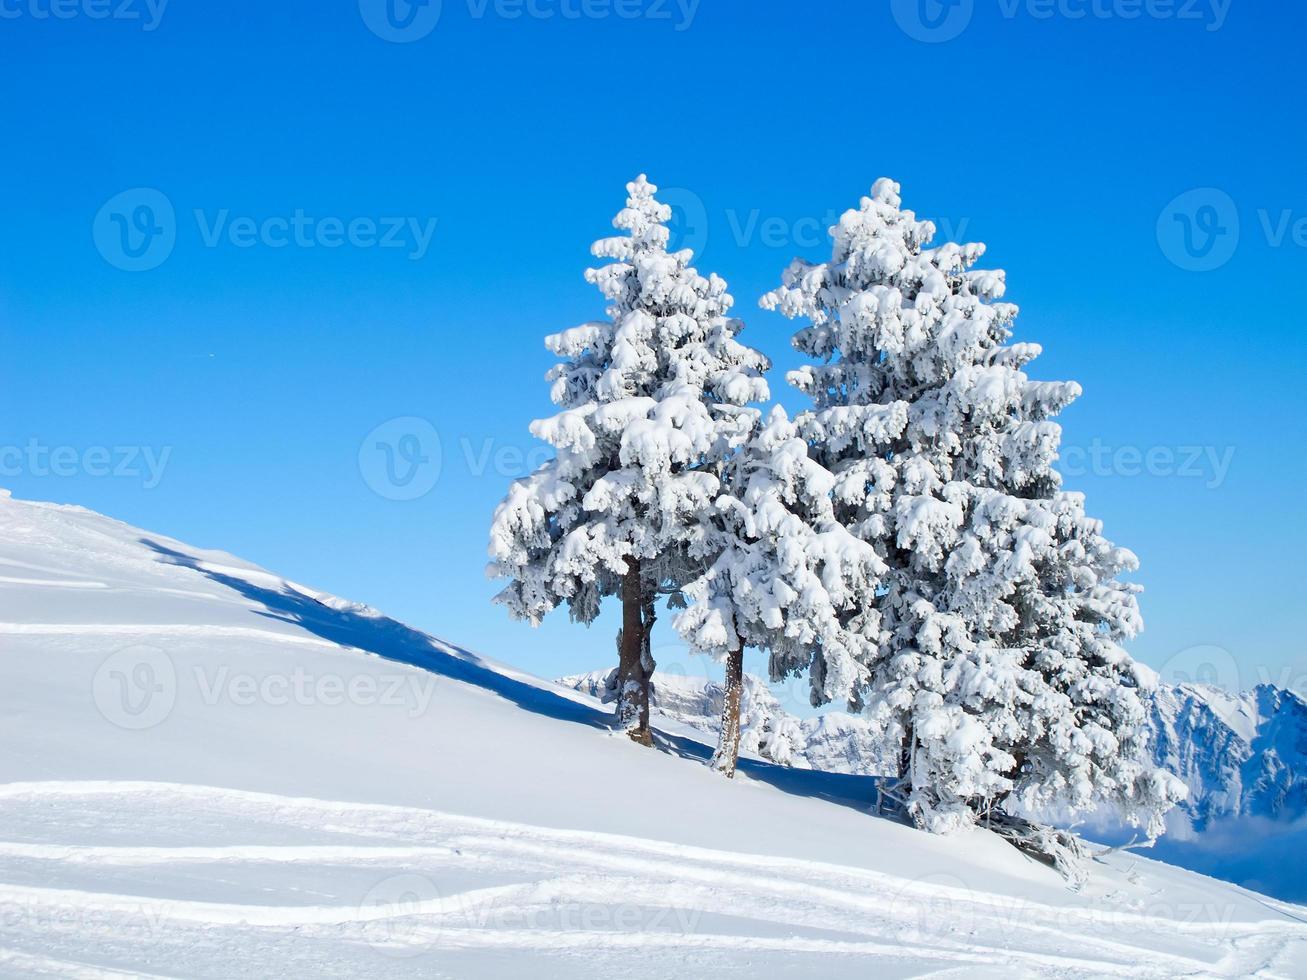 inverno nos alpes foto